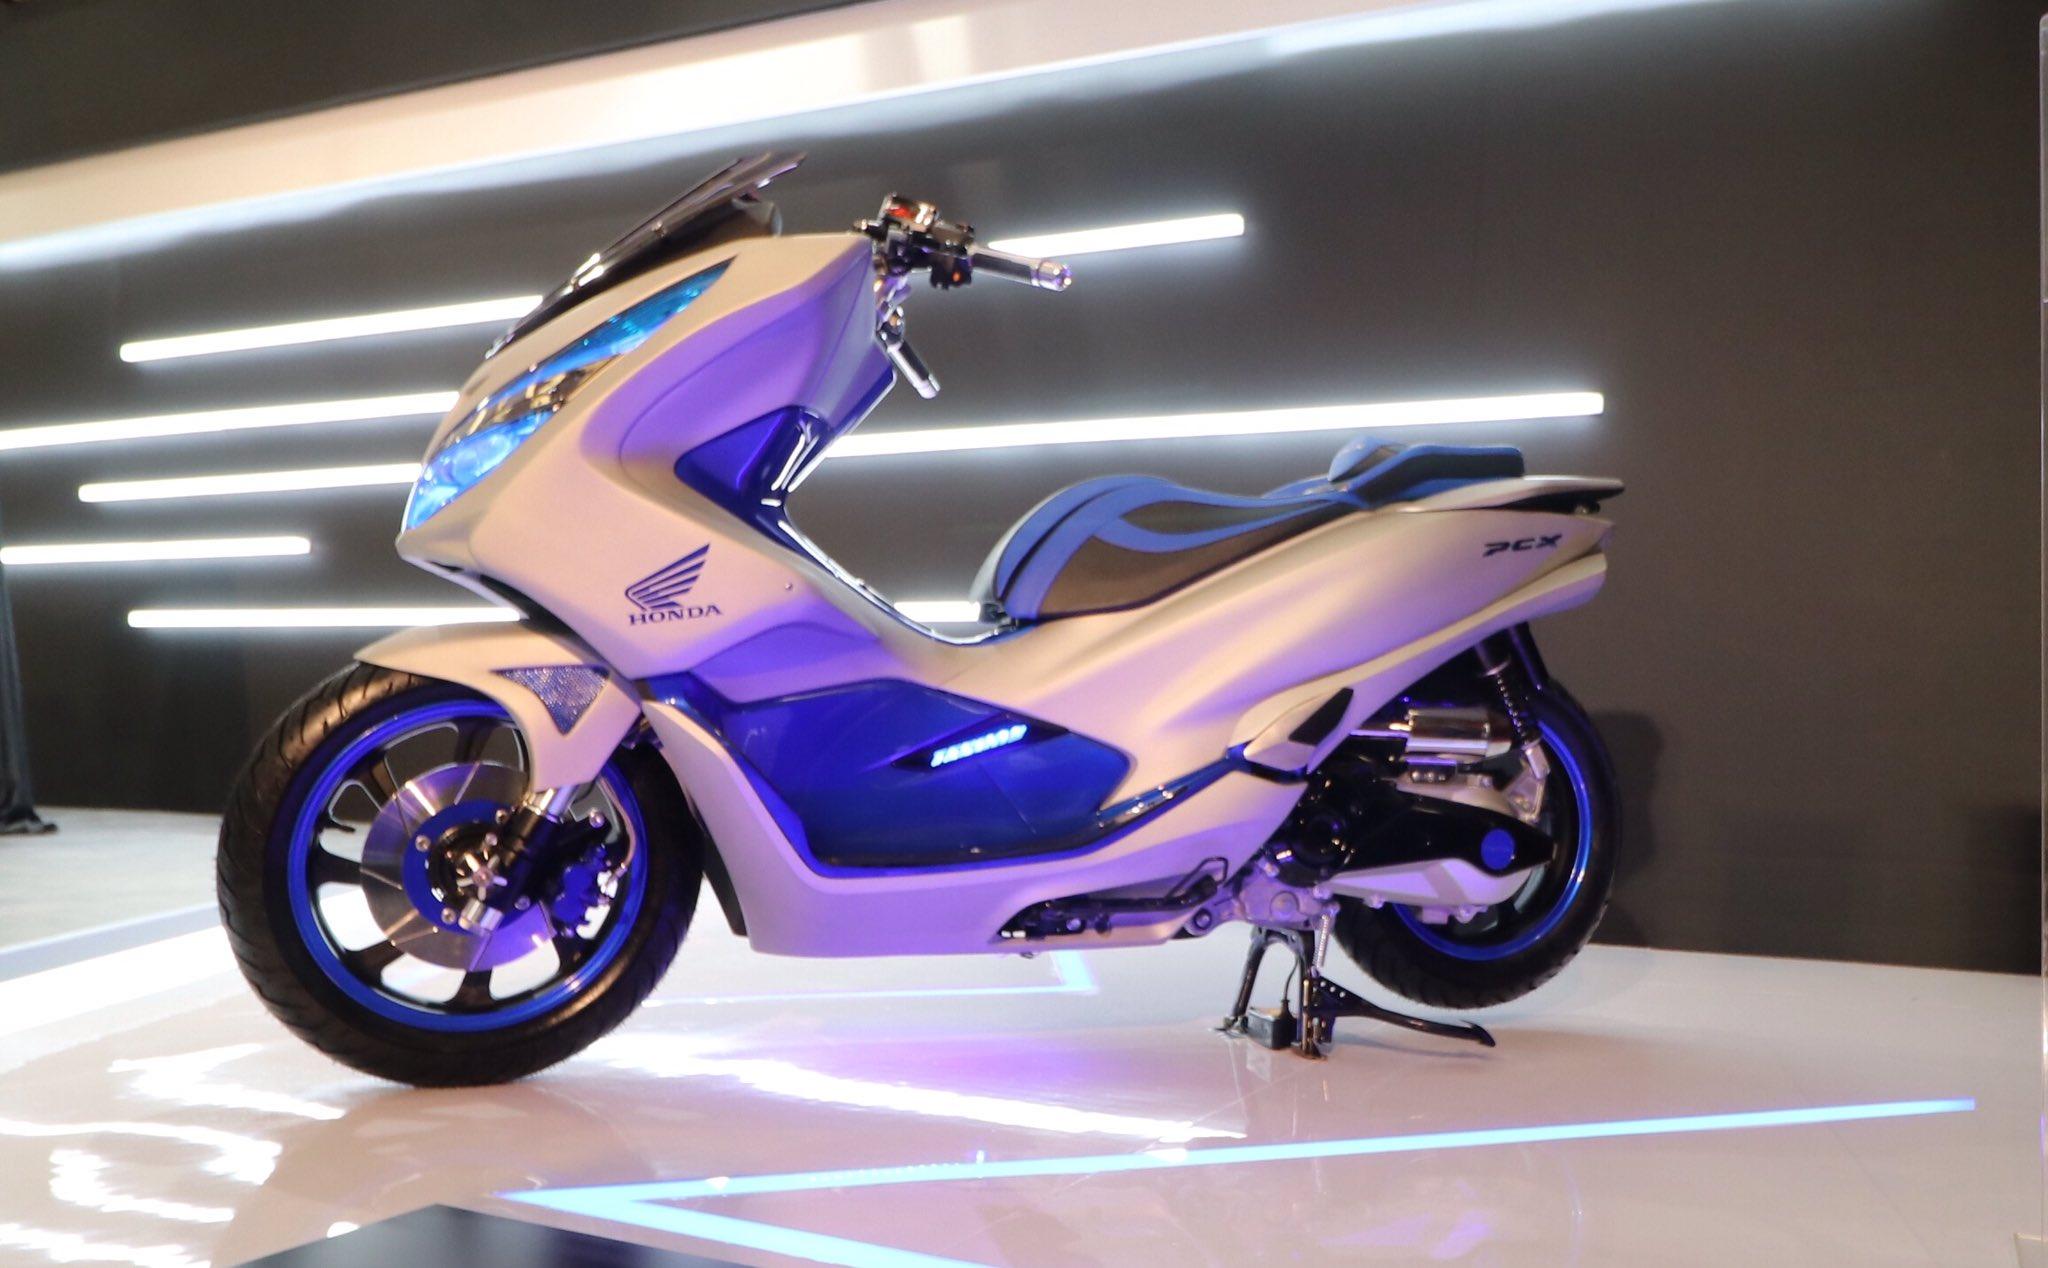 Modifikasi Honda PCX 150 Indonesia tahun 2018 versi Futuristic Techno